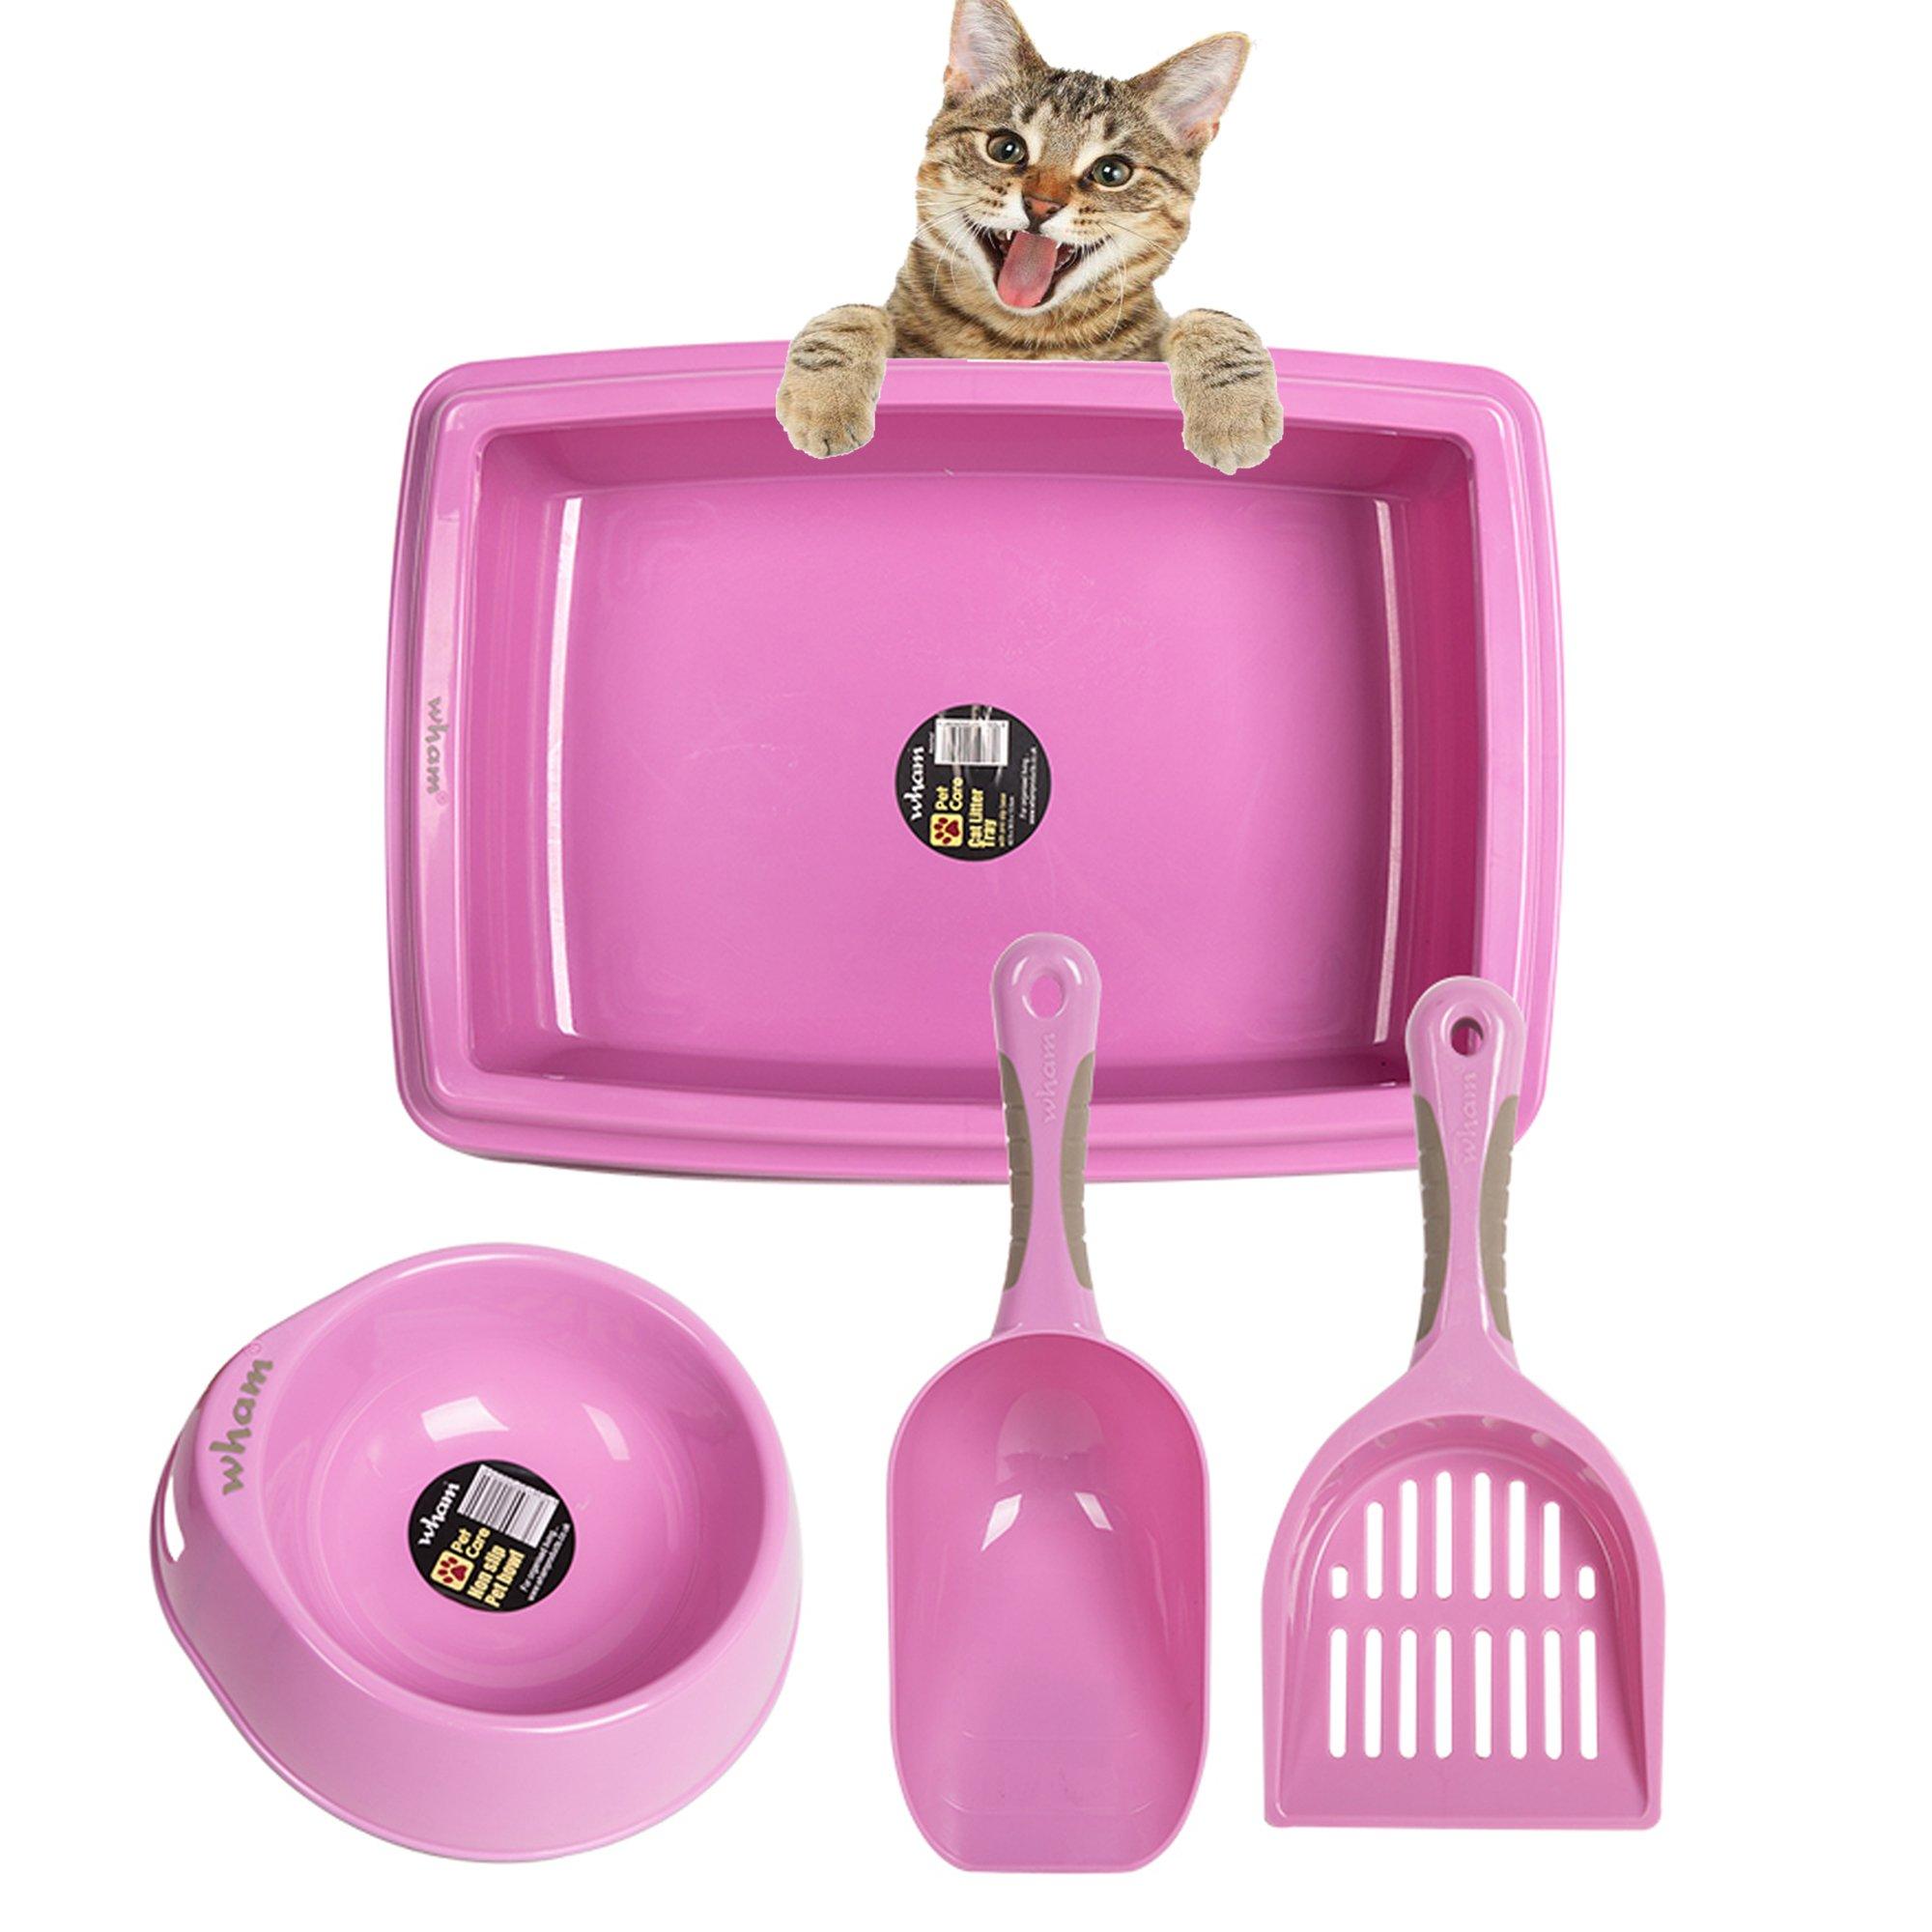 Lucky Tree 4 Color Cat Litter Pan Litter Box Plastic Cat Food Bowl with Scoop Shovel, 4Pcs Pet Supplies Set for Cats